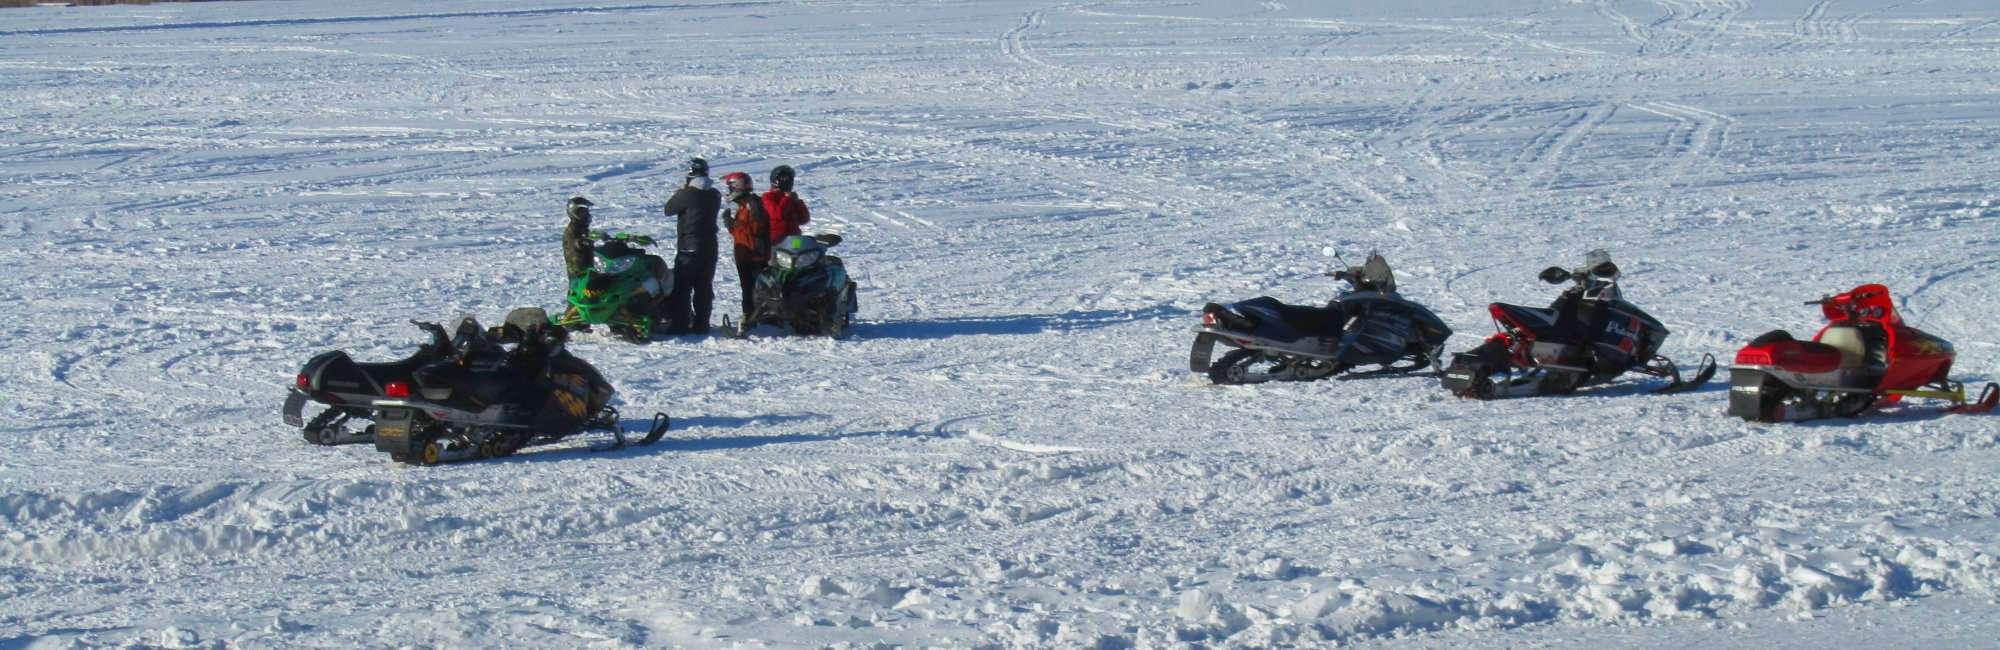 Slide-Winter-Snowmobile